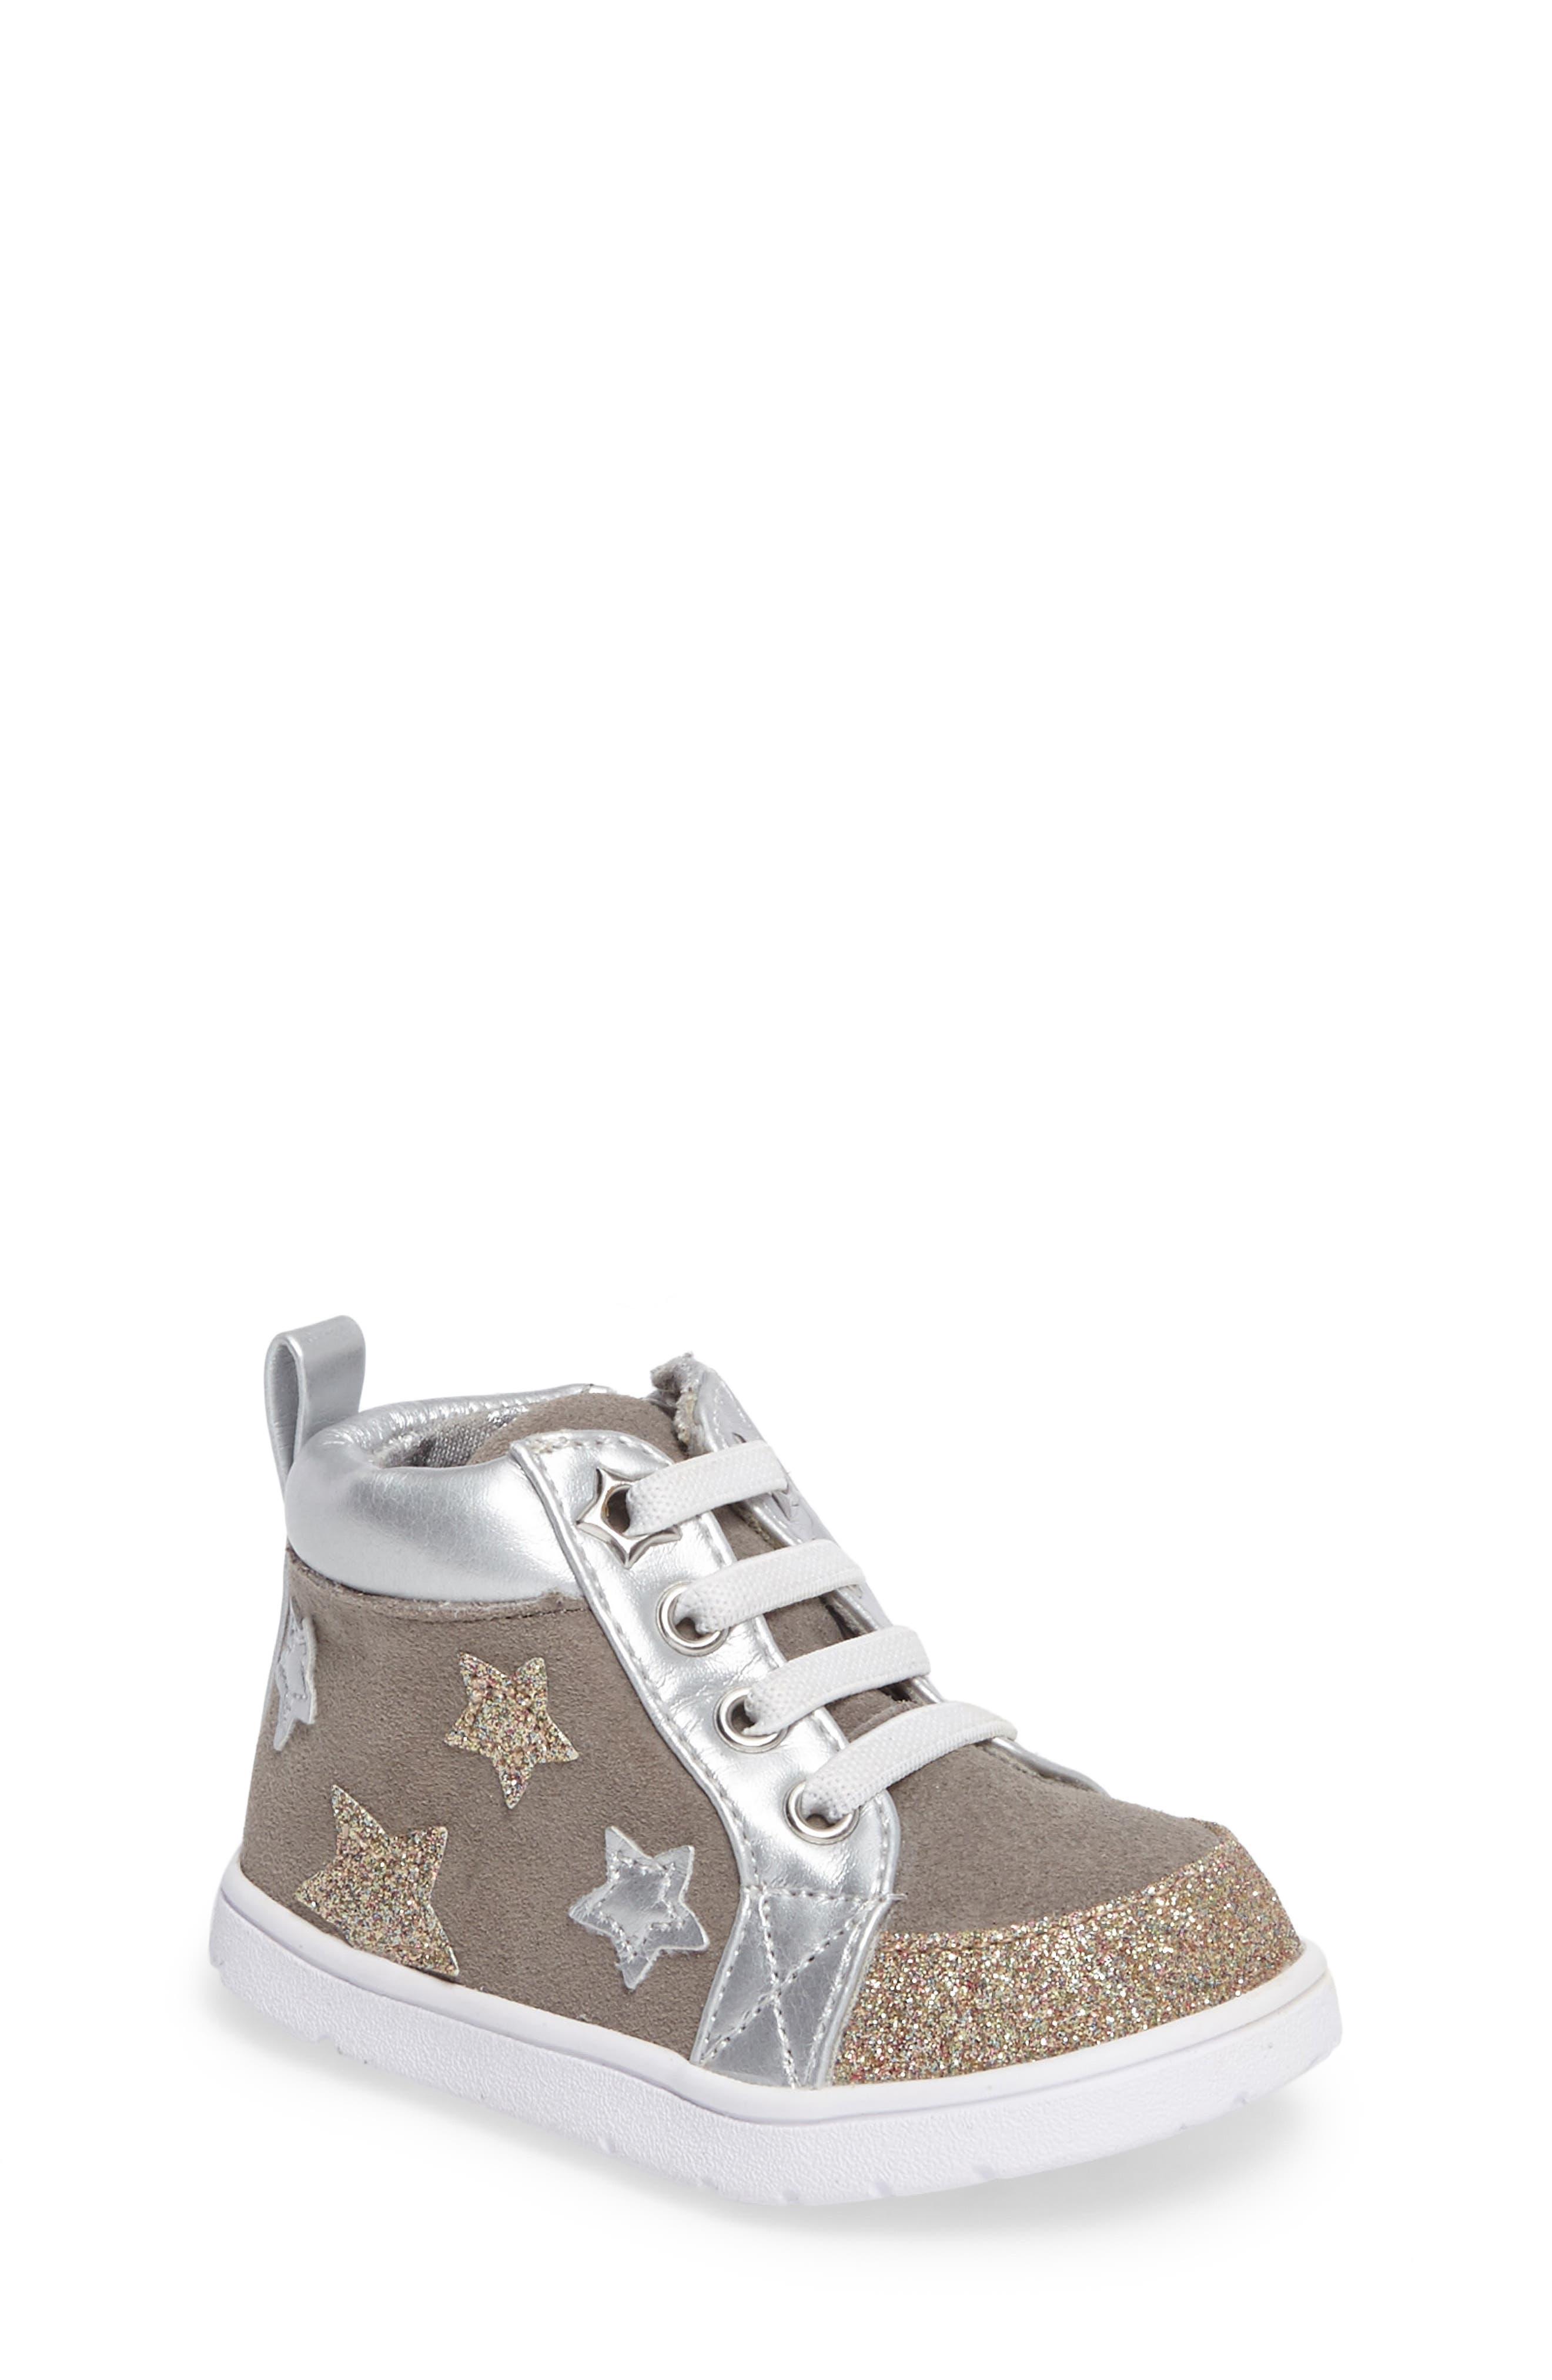 Diantha Star Appliqué High Top Sneaker,                         Main,                         color, 020